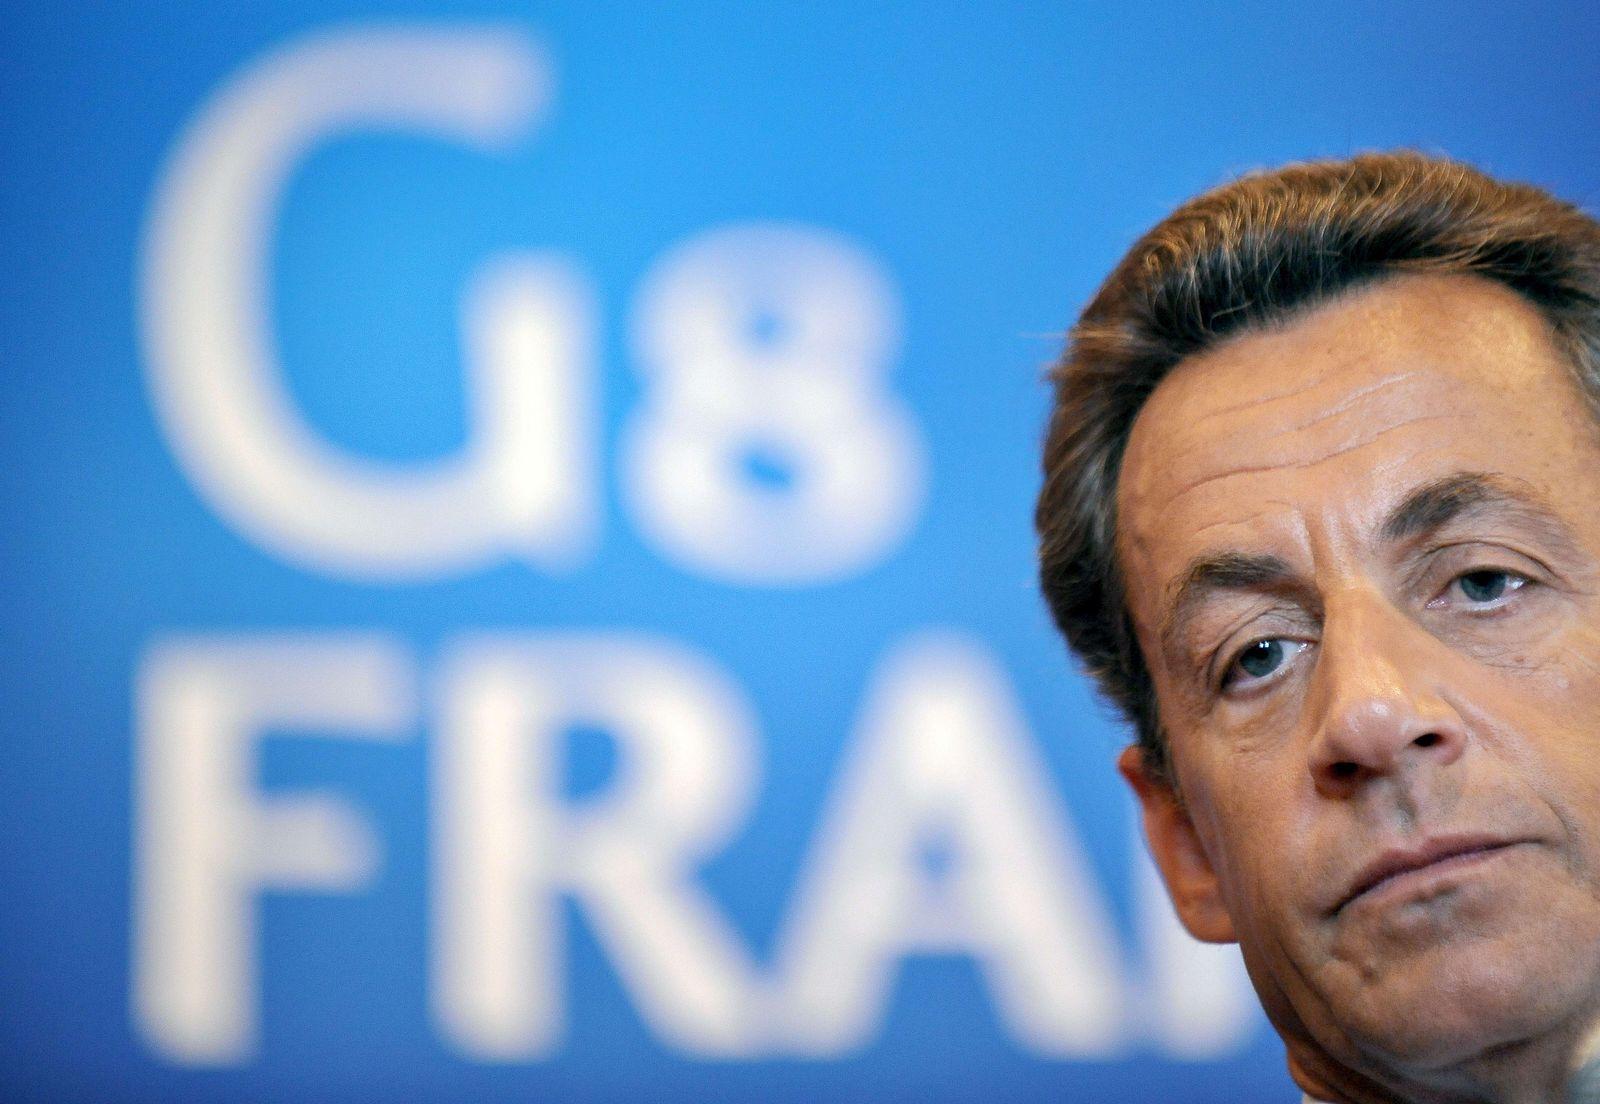 FRANCE-G8-SUMMIT-US-OBAMA-SARKOZY